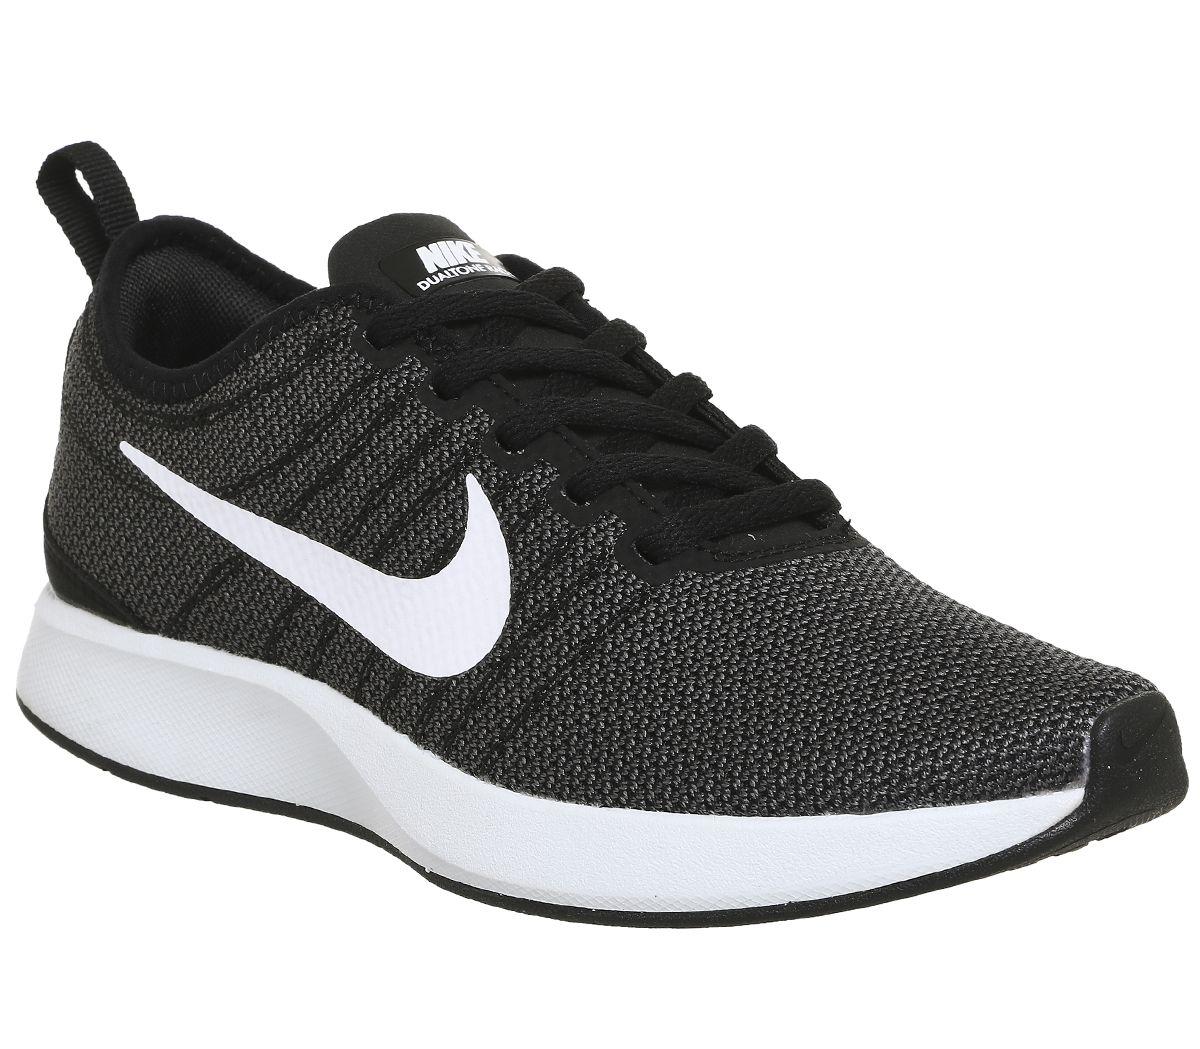 d843f0eca20bf Nike Dualtone Racer Black White - Hers trainers